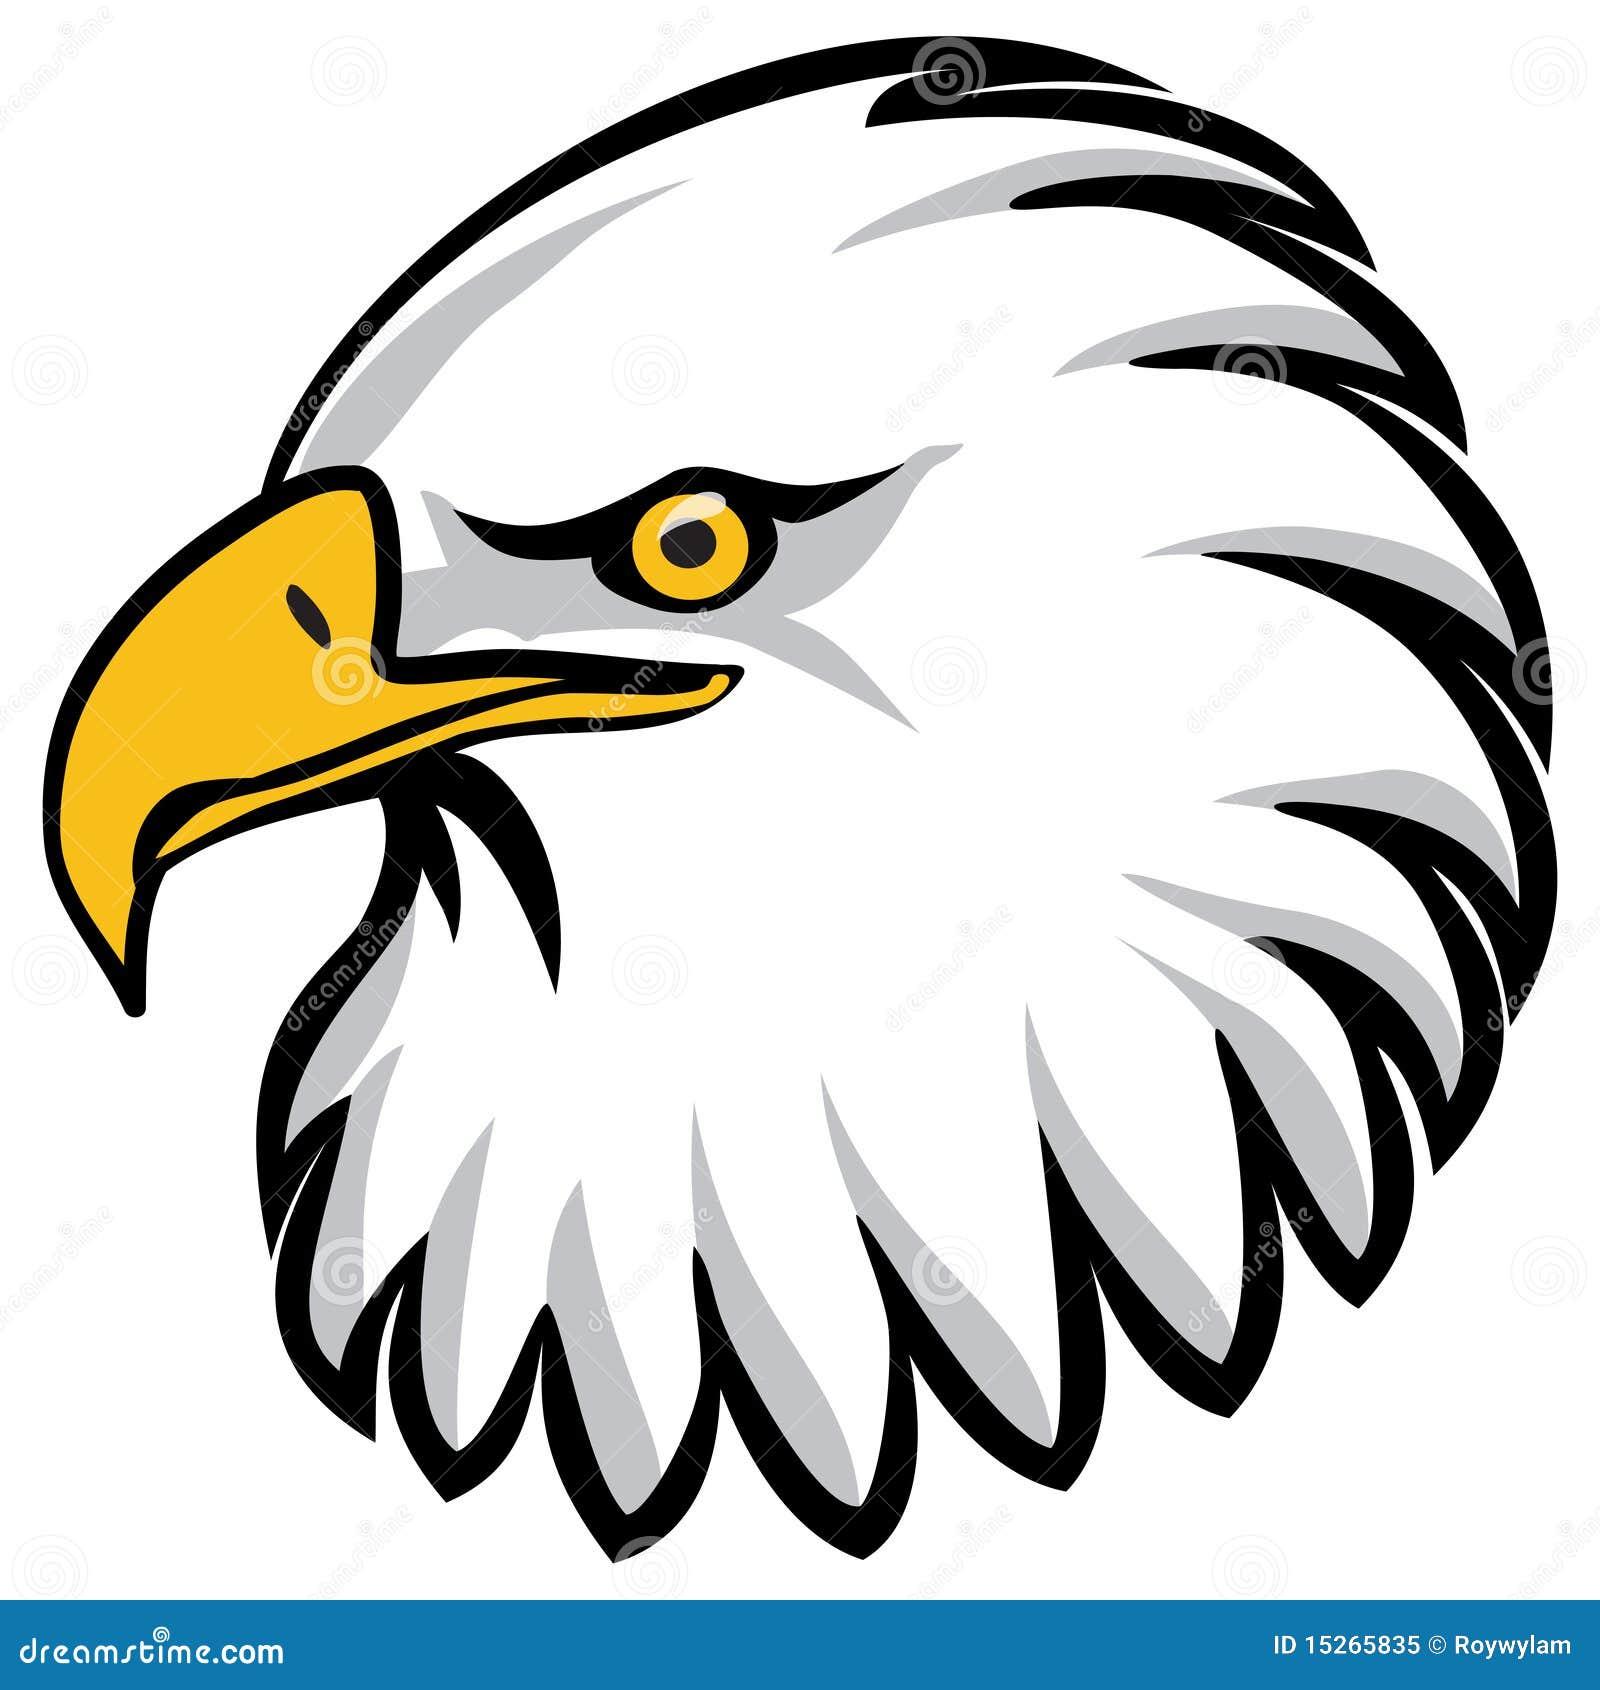 https://thumbs.dreamstime.com/z/eagle-15265835.jpg Eagle Drawing Easy